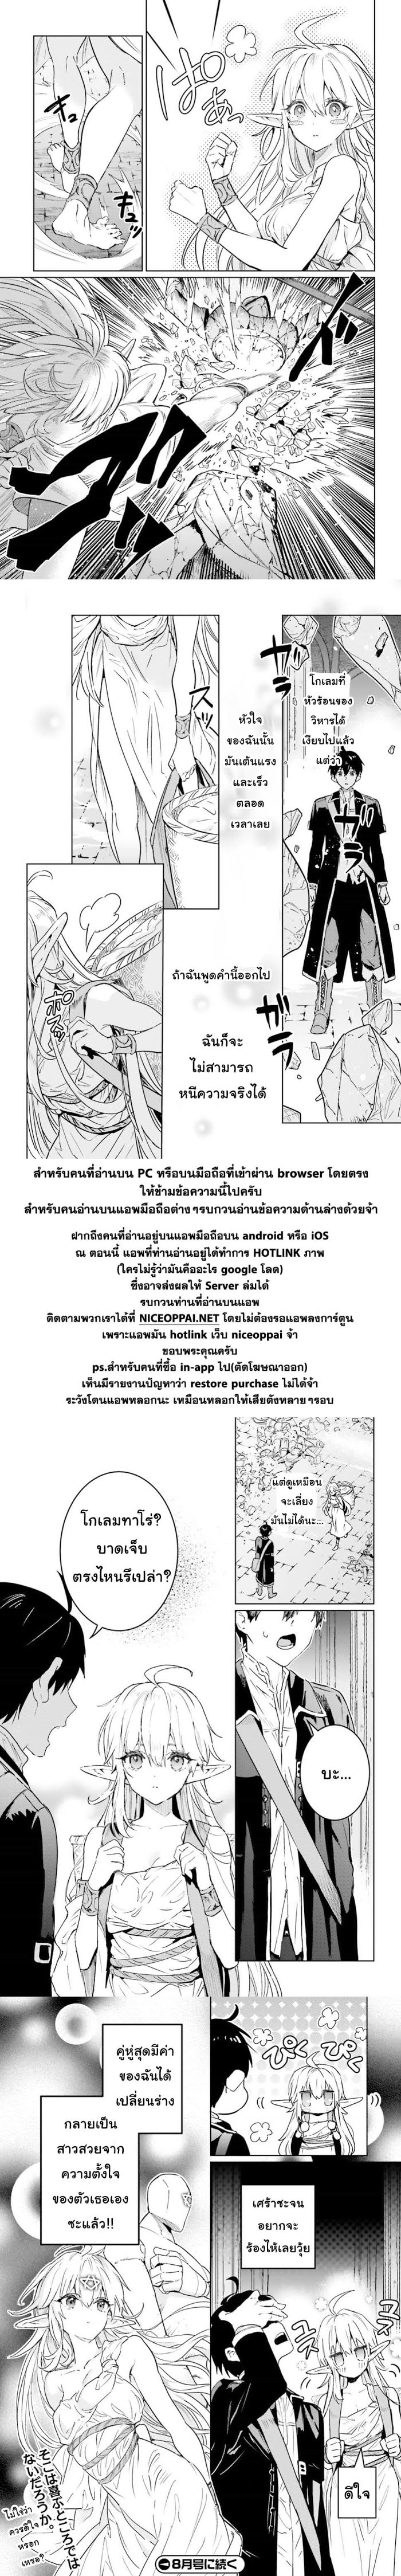 Hametsu no Madou Ou to Golem no Ban Kisaki - หน้า 29